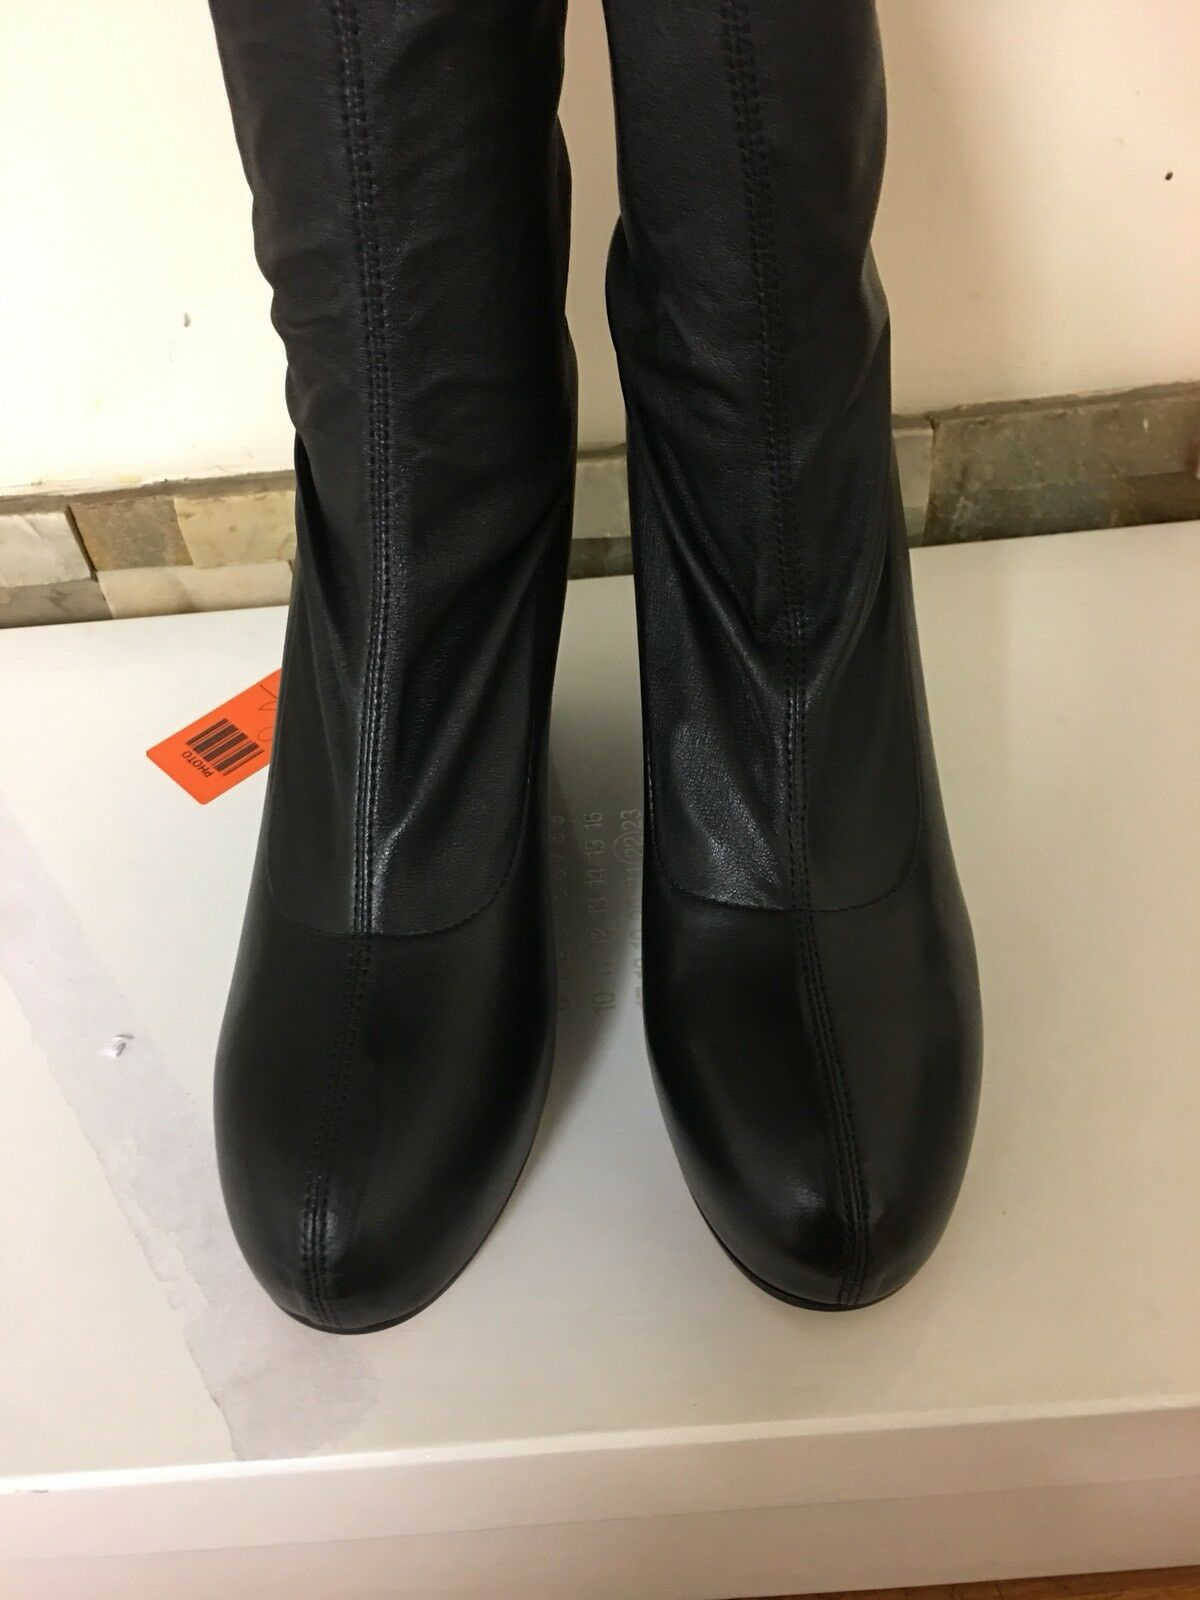 Maison Martin Margiela cuña de cuero negro negro cuero botas talla Muslo Reino Unido 3 EU 36 6b1b8e